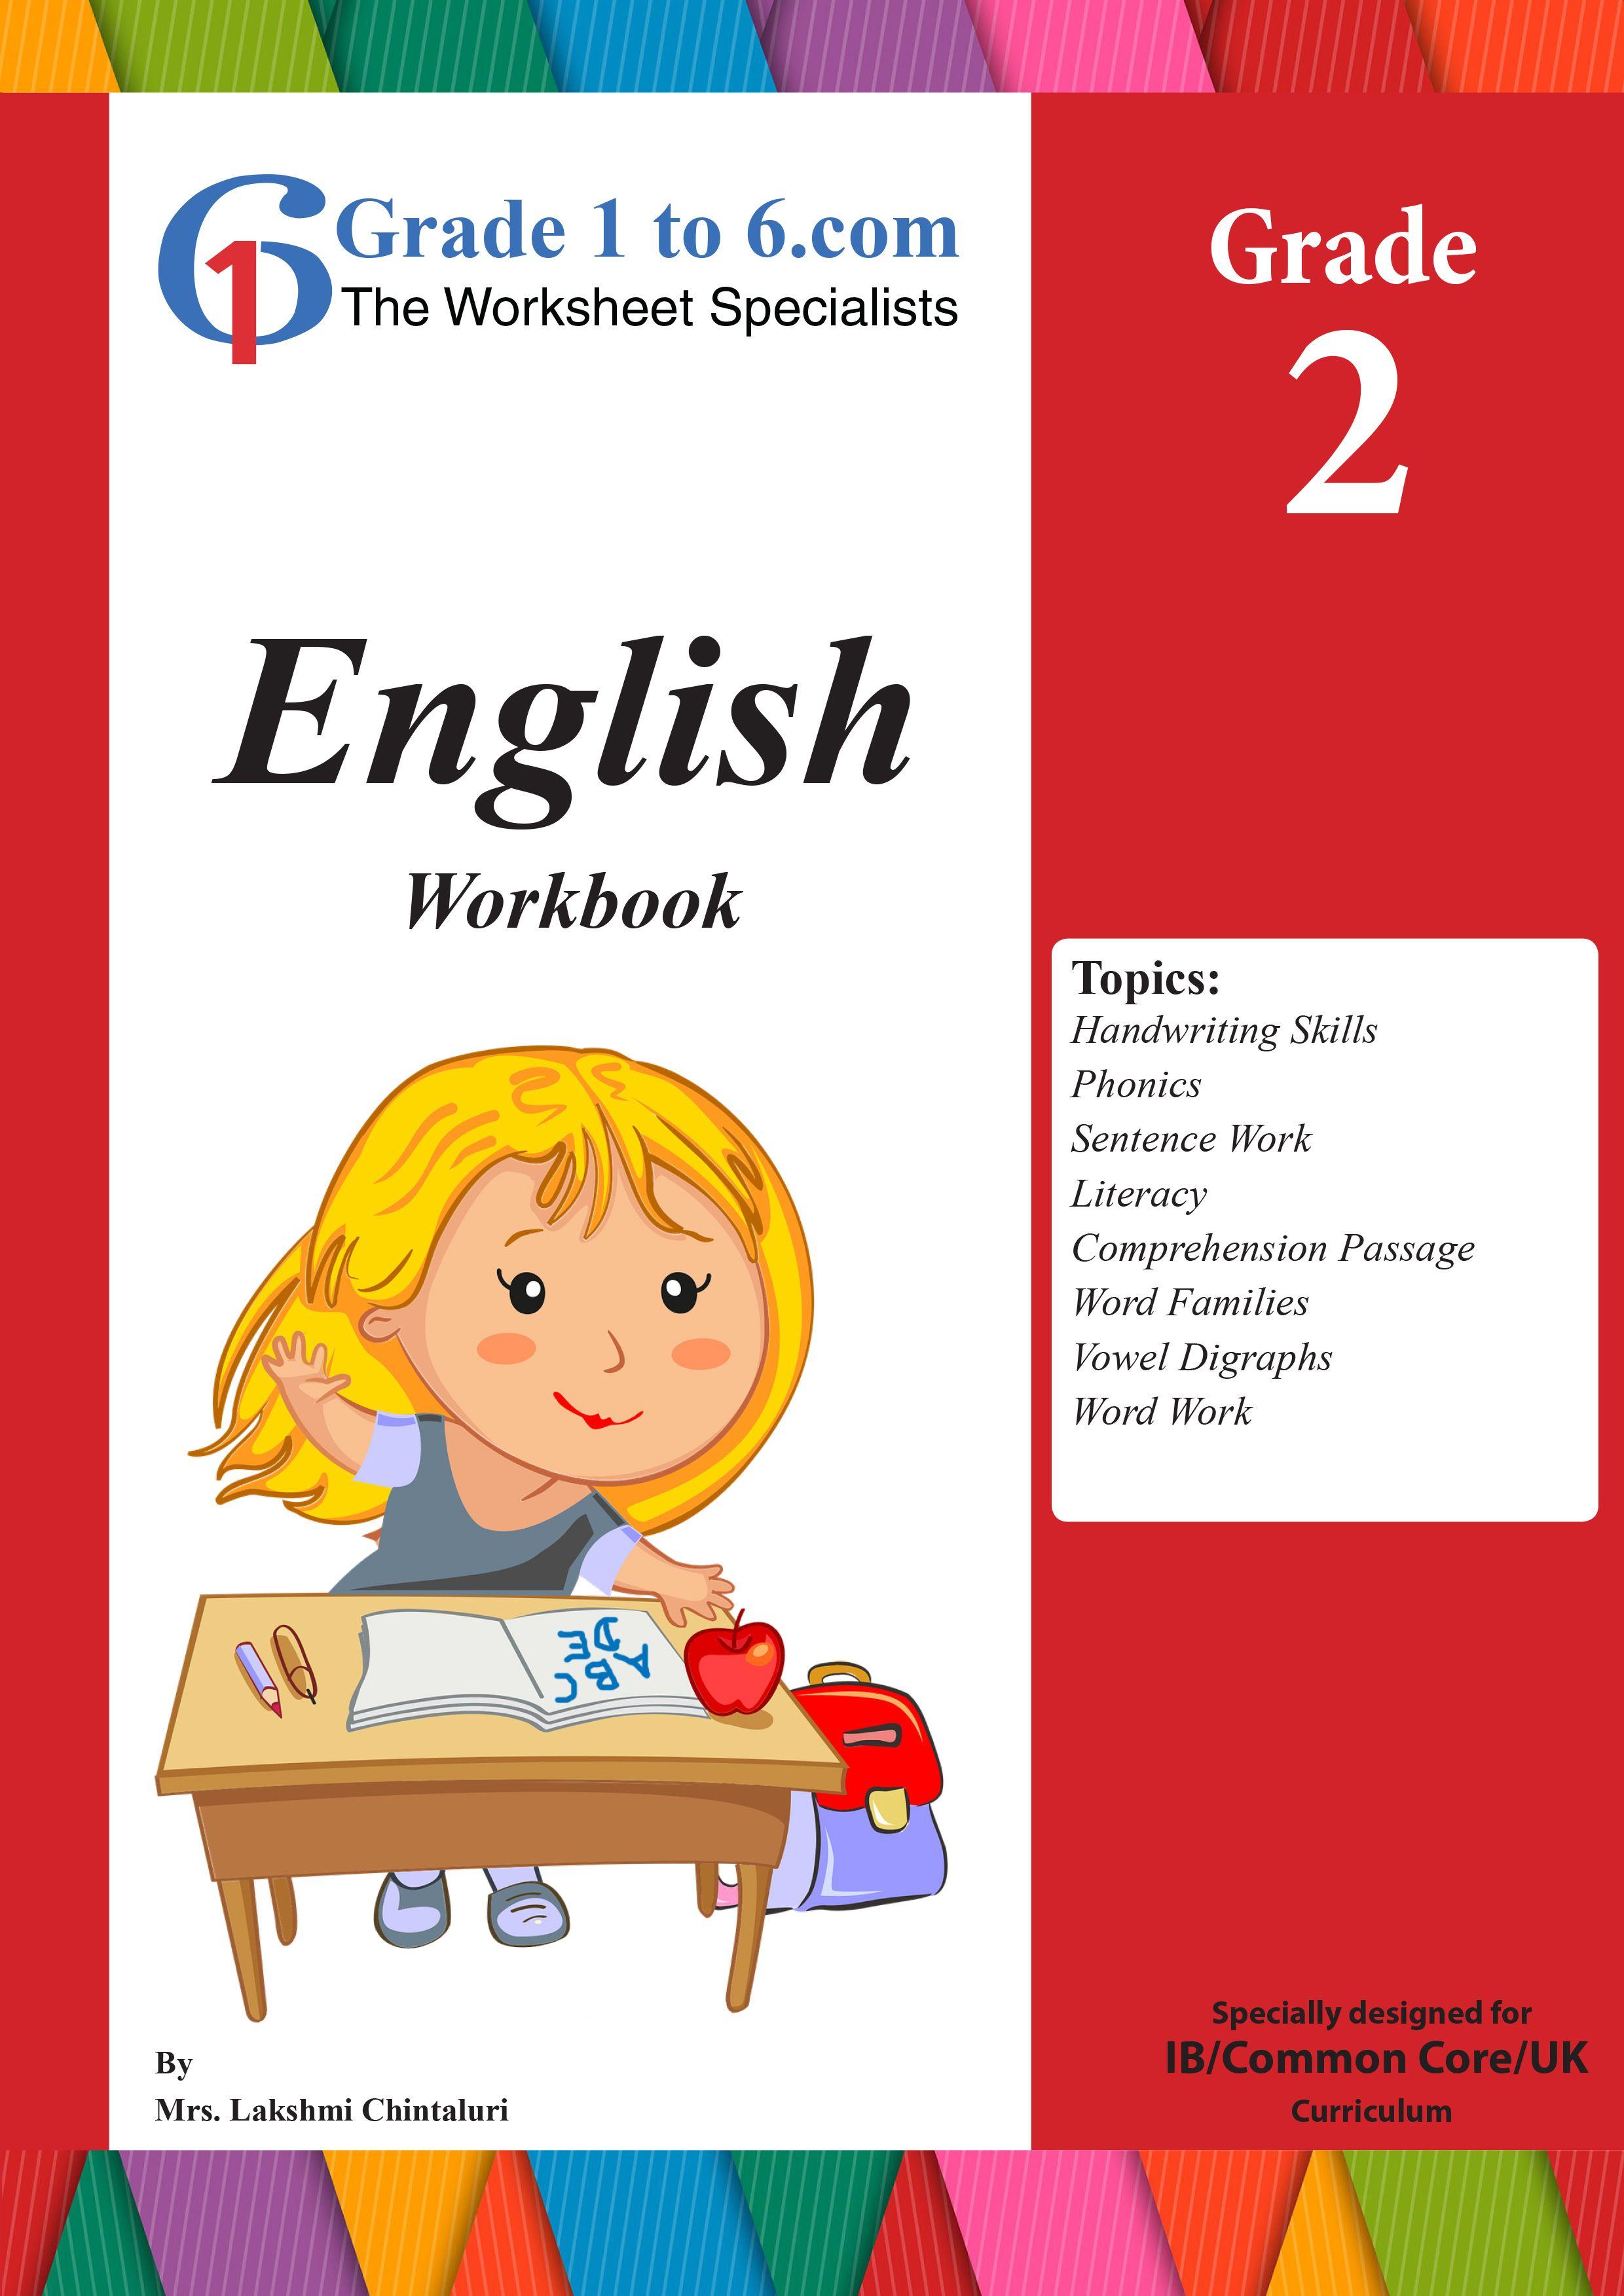 Grade 2 English Workbook/ Worksheets bundle from www.Grade1to6.com ...